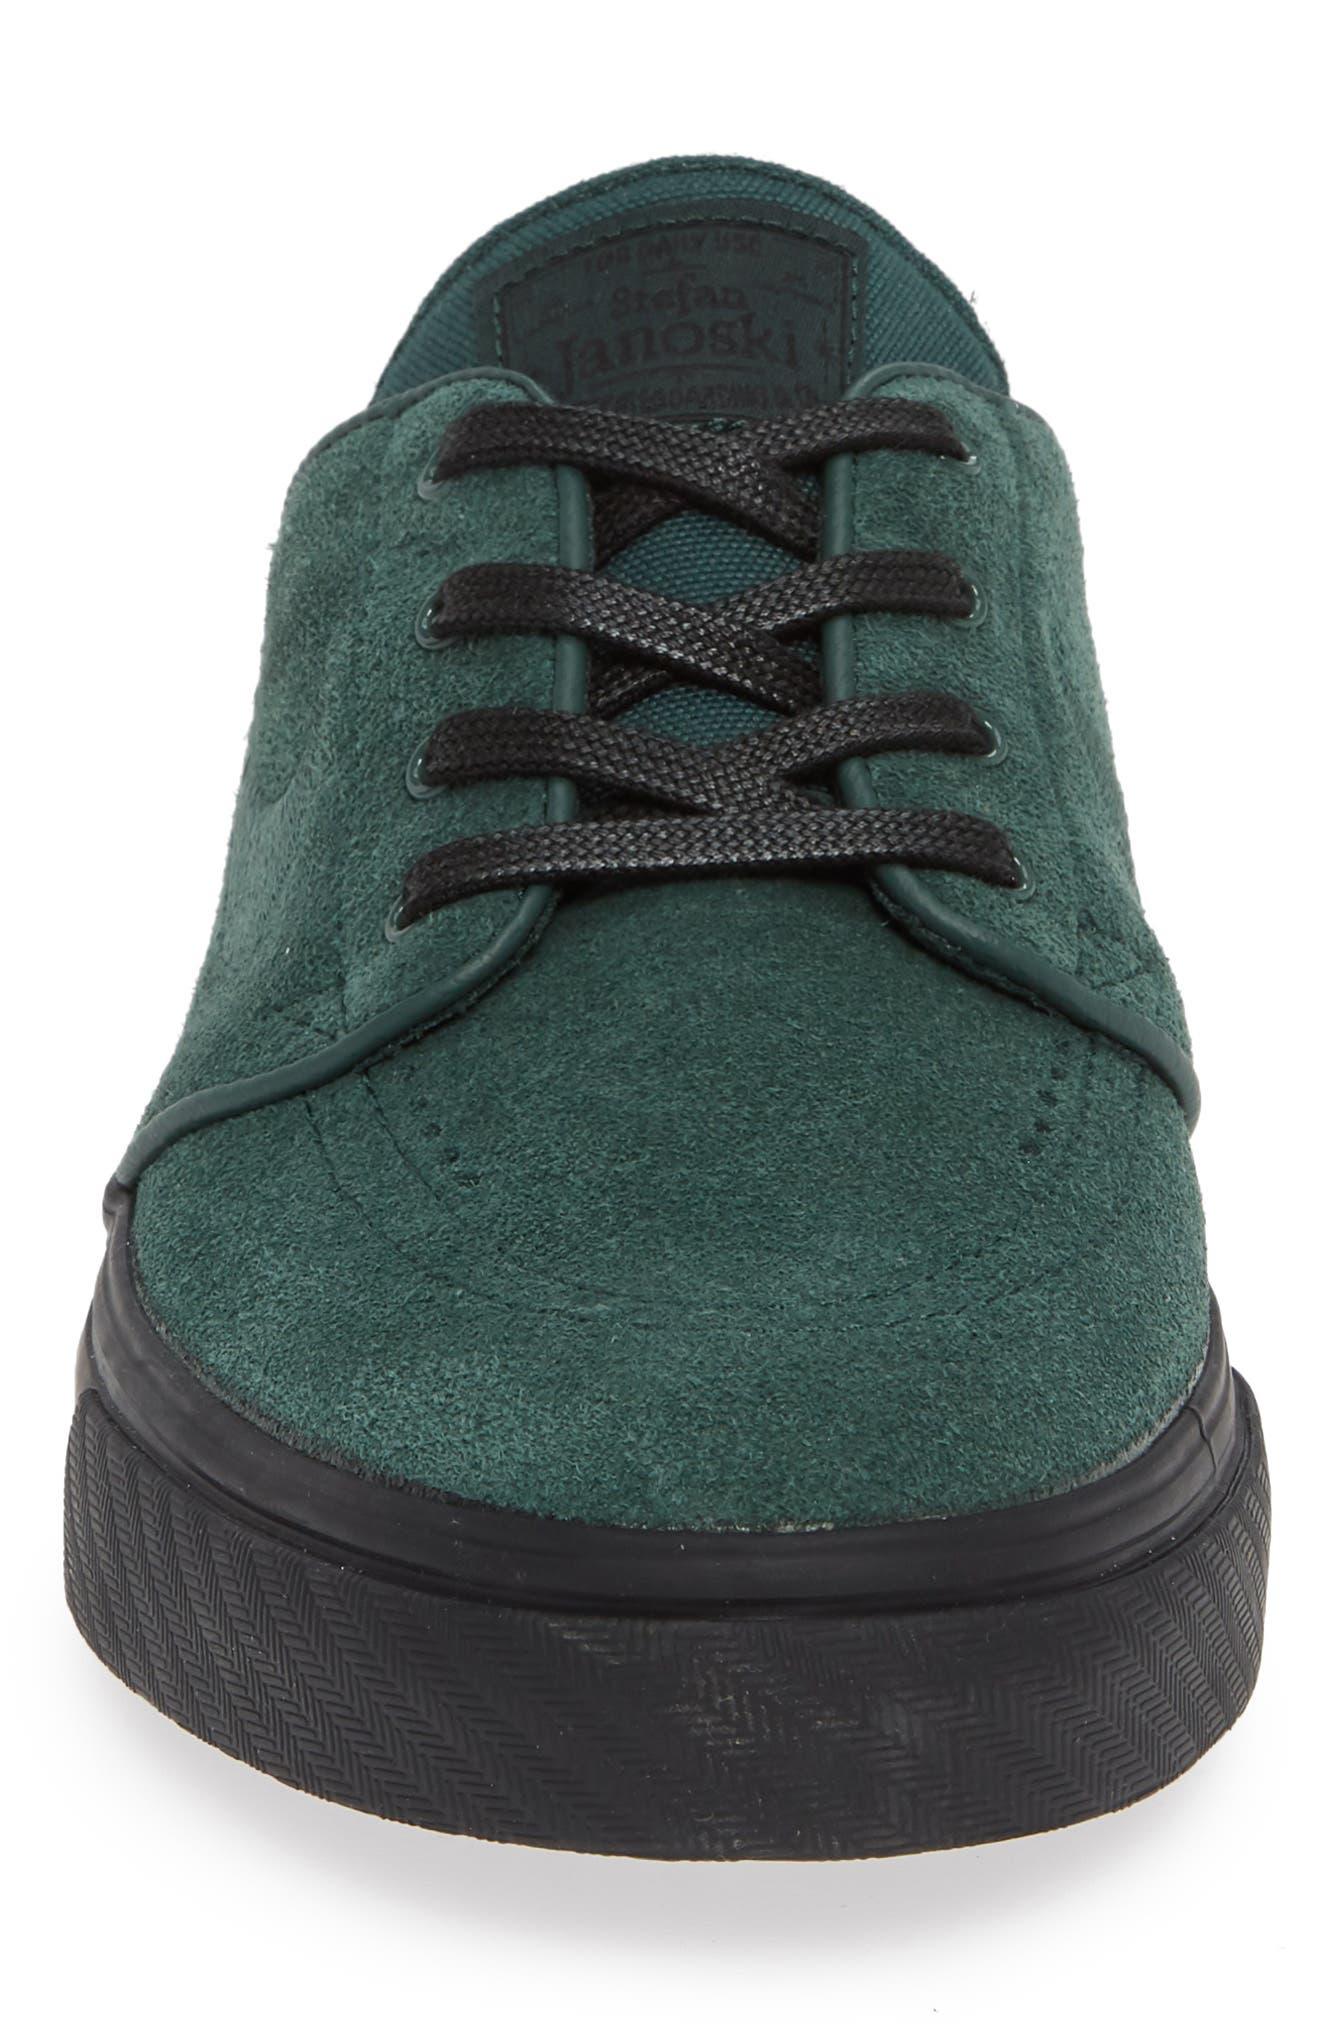 'Zoom - Stefan Janoski' Skate Shoe,                             Alternate thumbnail 6, color,                             Midnight Green/ Black